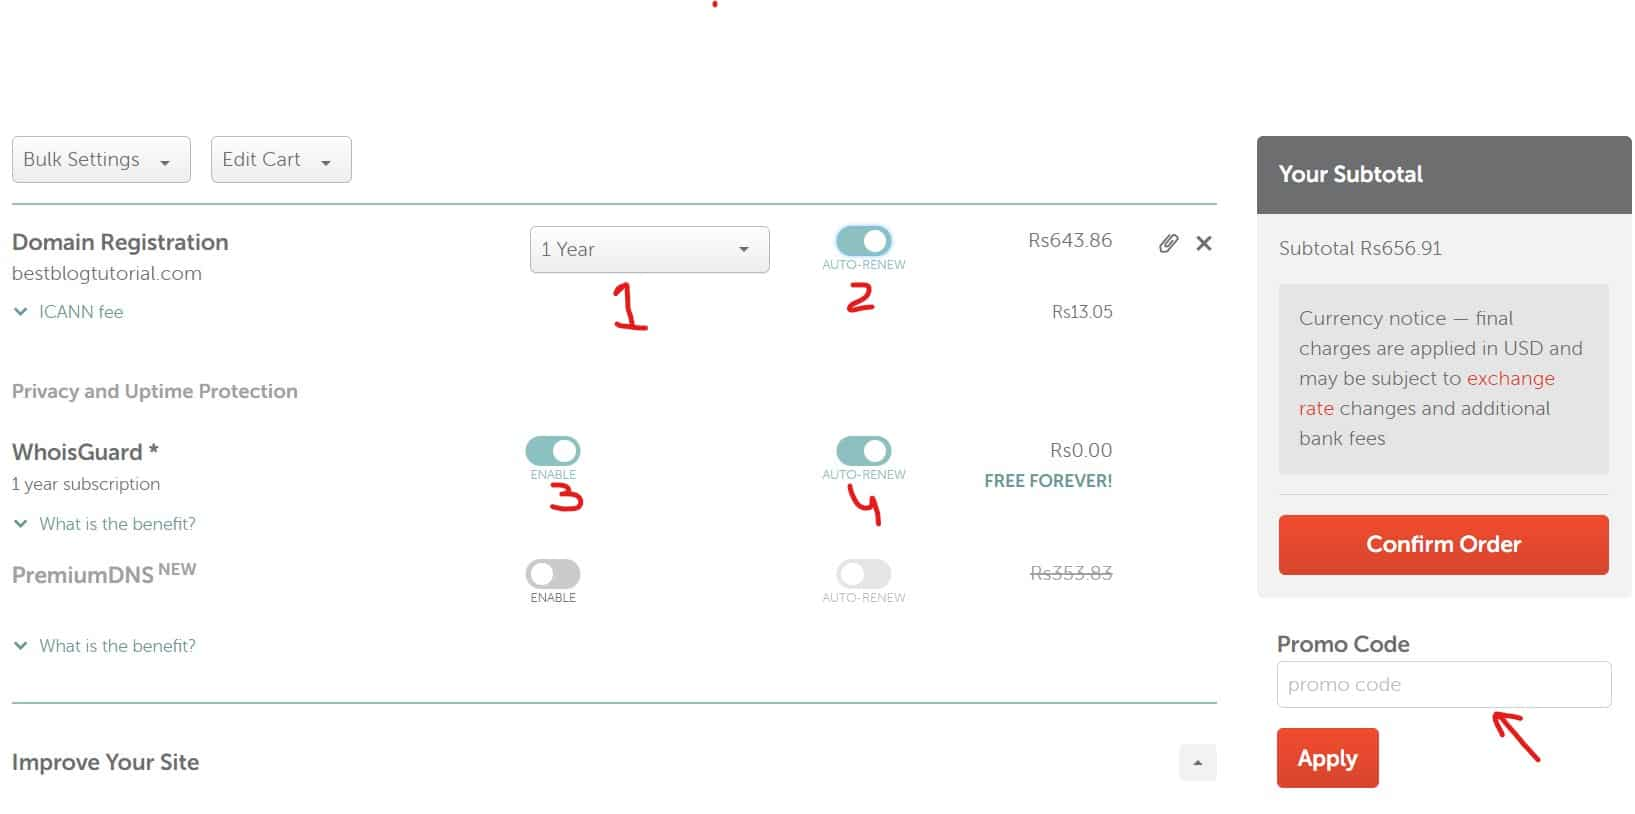 Step 4: Buy Domain Name from Namecheap